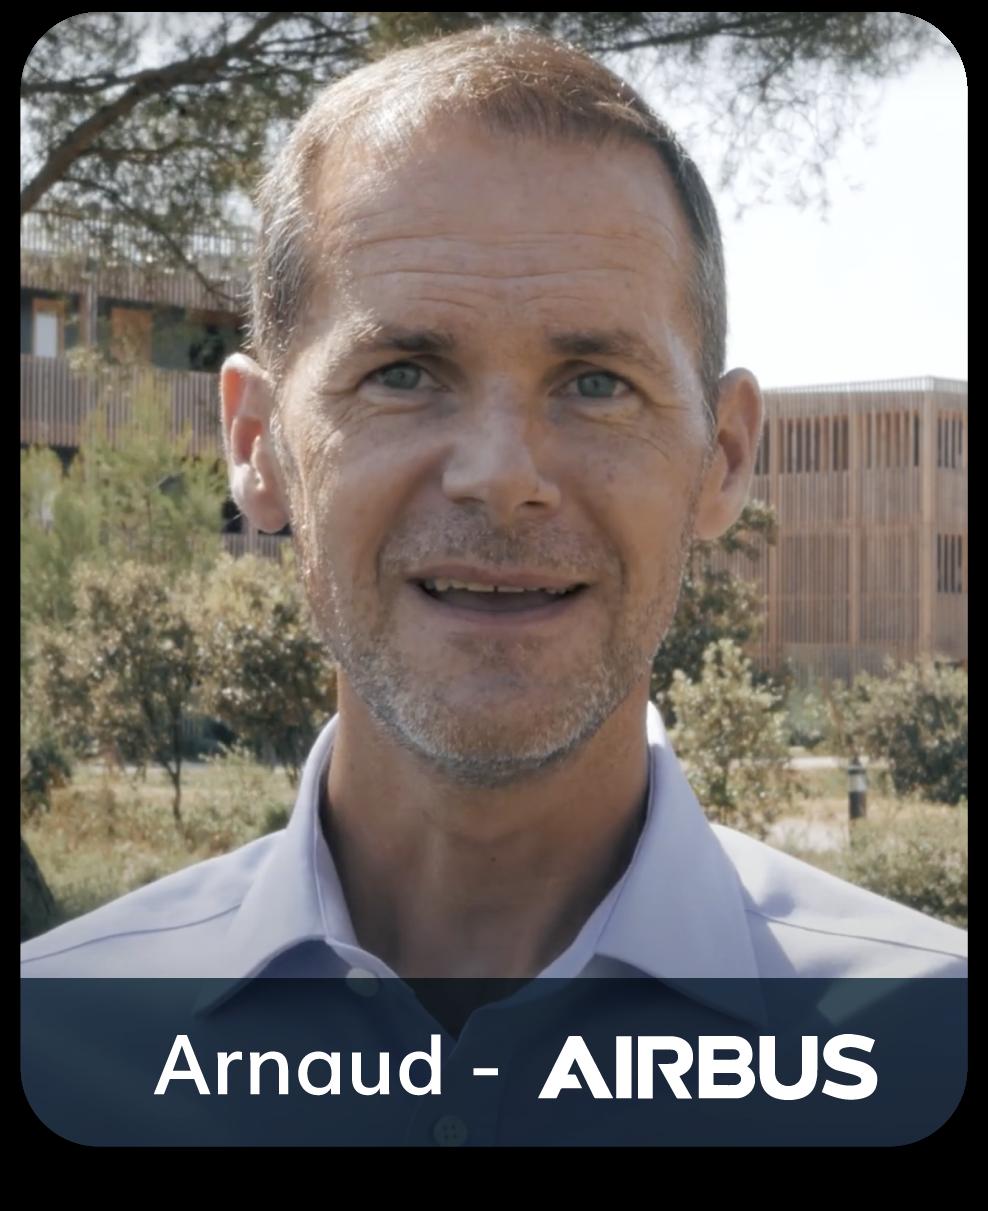 Arnaud Airbus positive leader